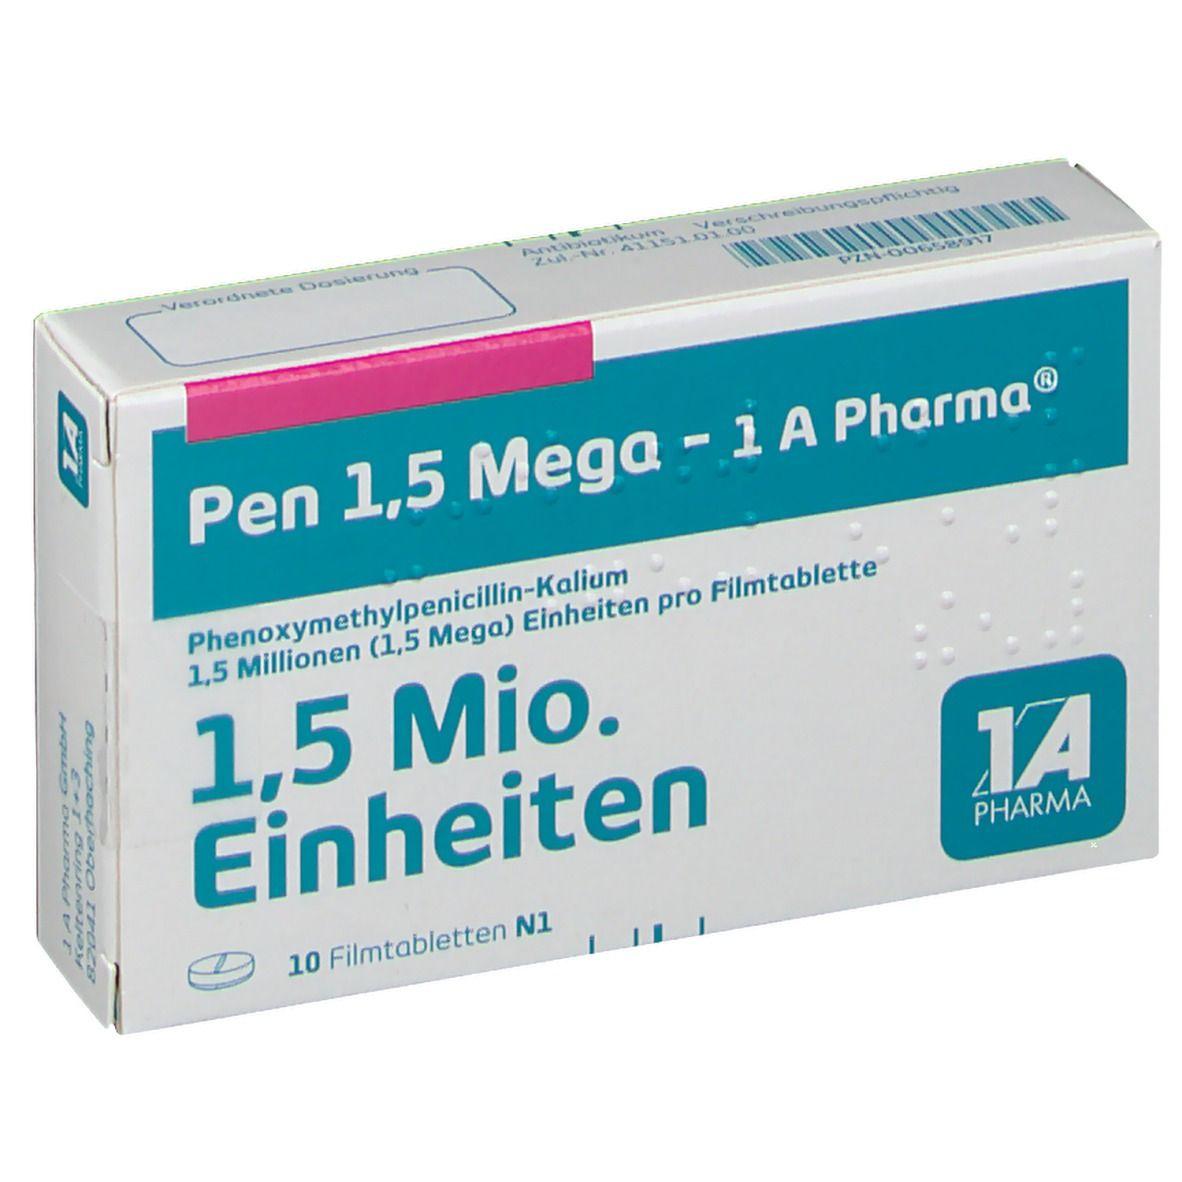 Pen 1,5 Mega 1a Pharma Filmtabl.